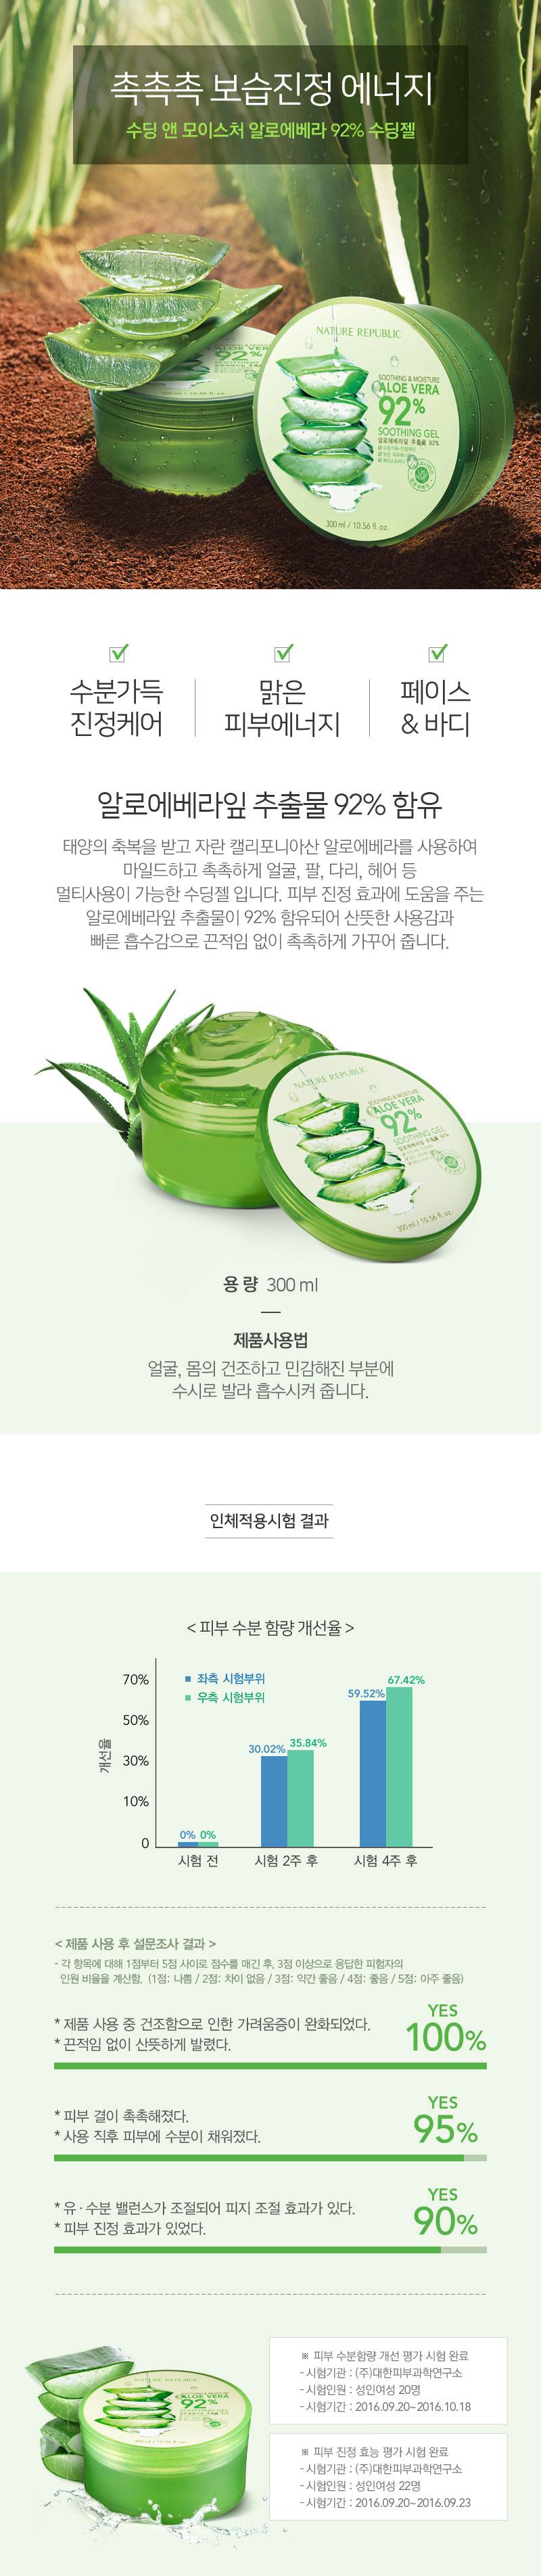 NATURE REPUBLIC Smoothing & Moisture Aloe Vera 92% Soothing Gel